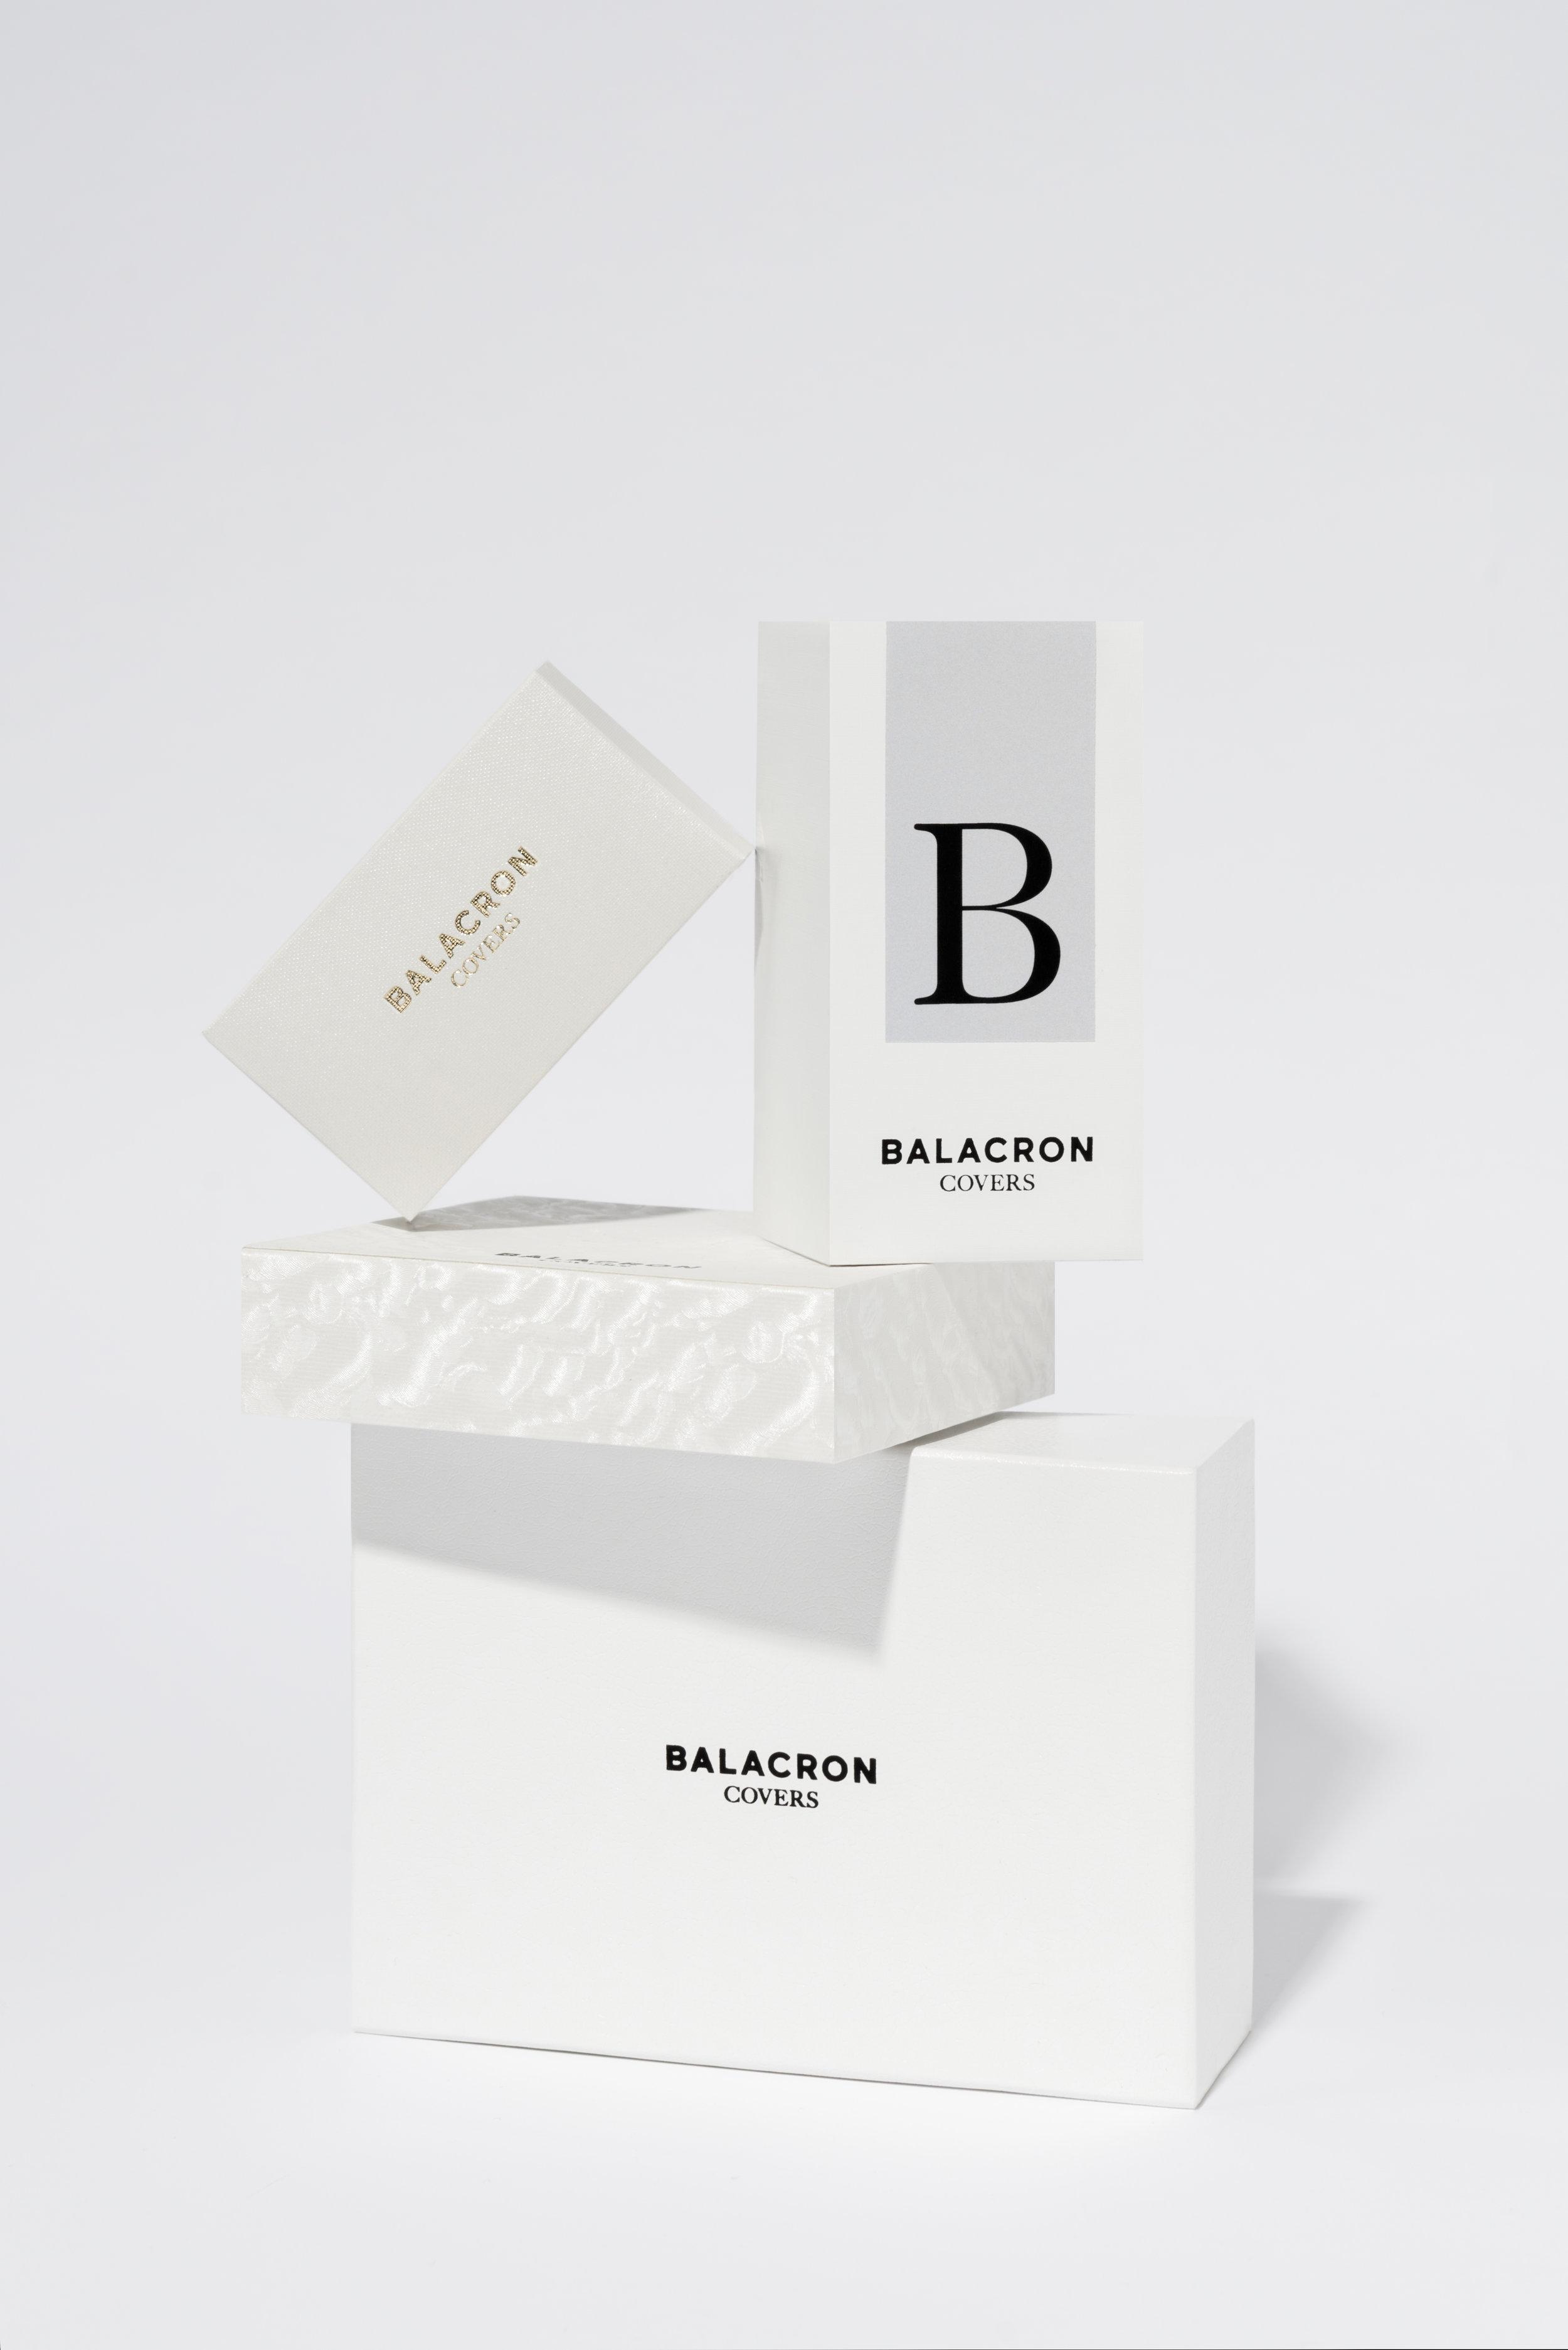 BN_boxes_white_flat.jpg